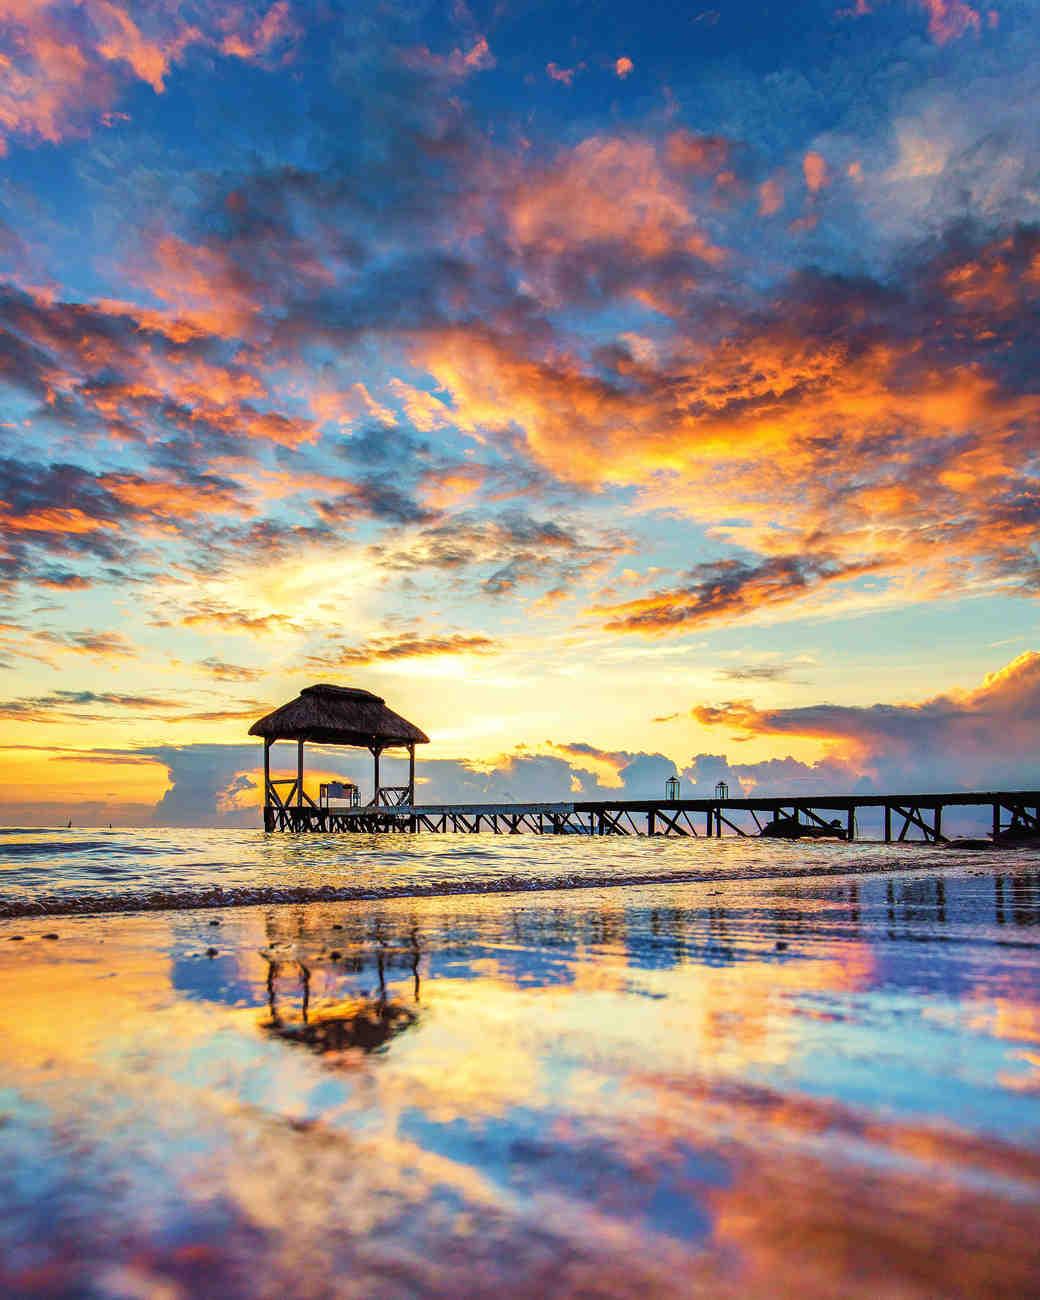 mauritius travel photo